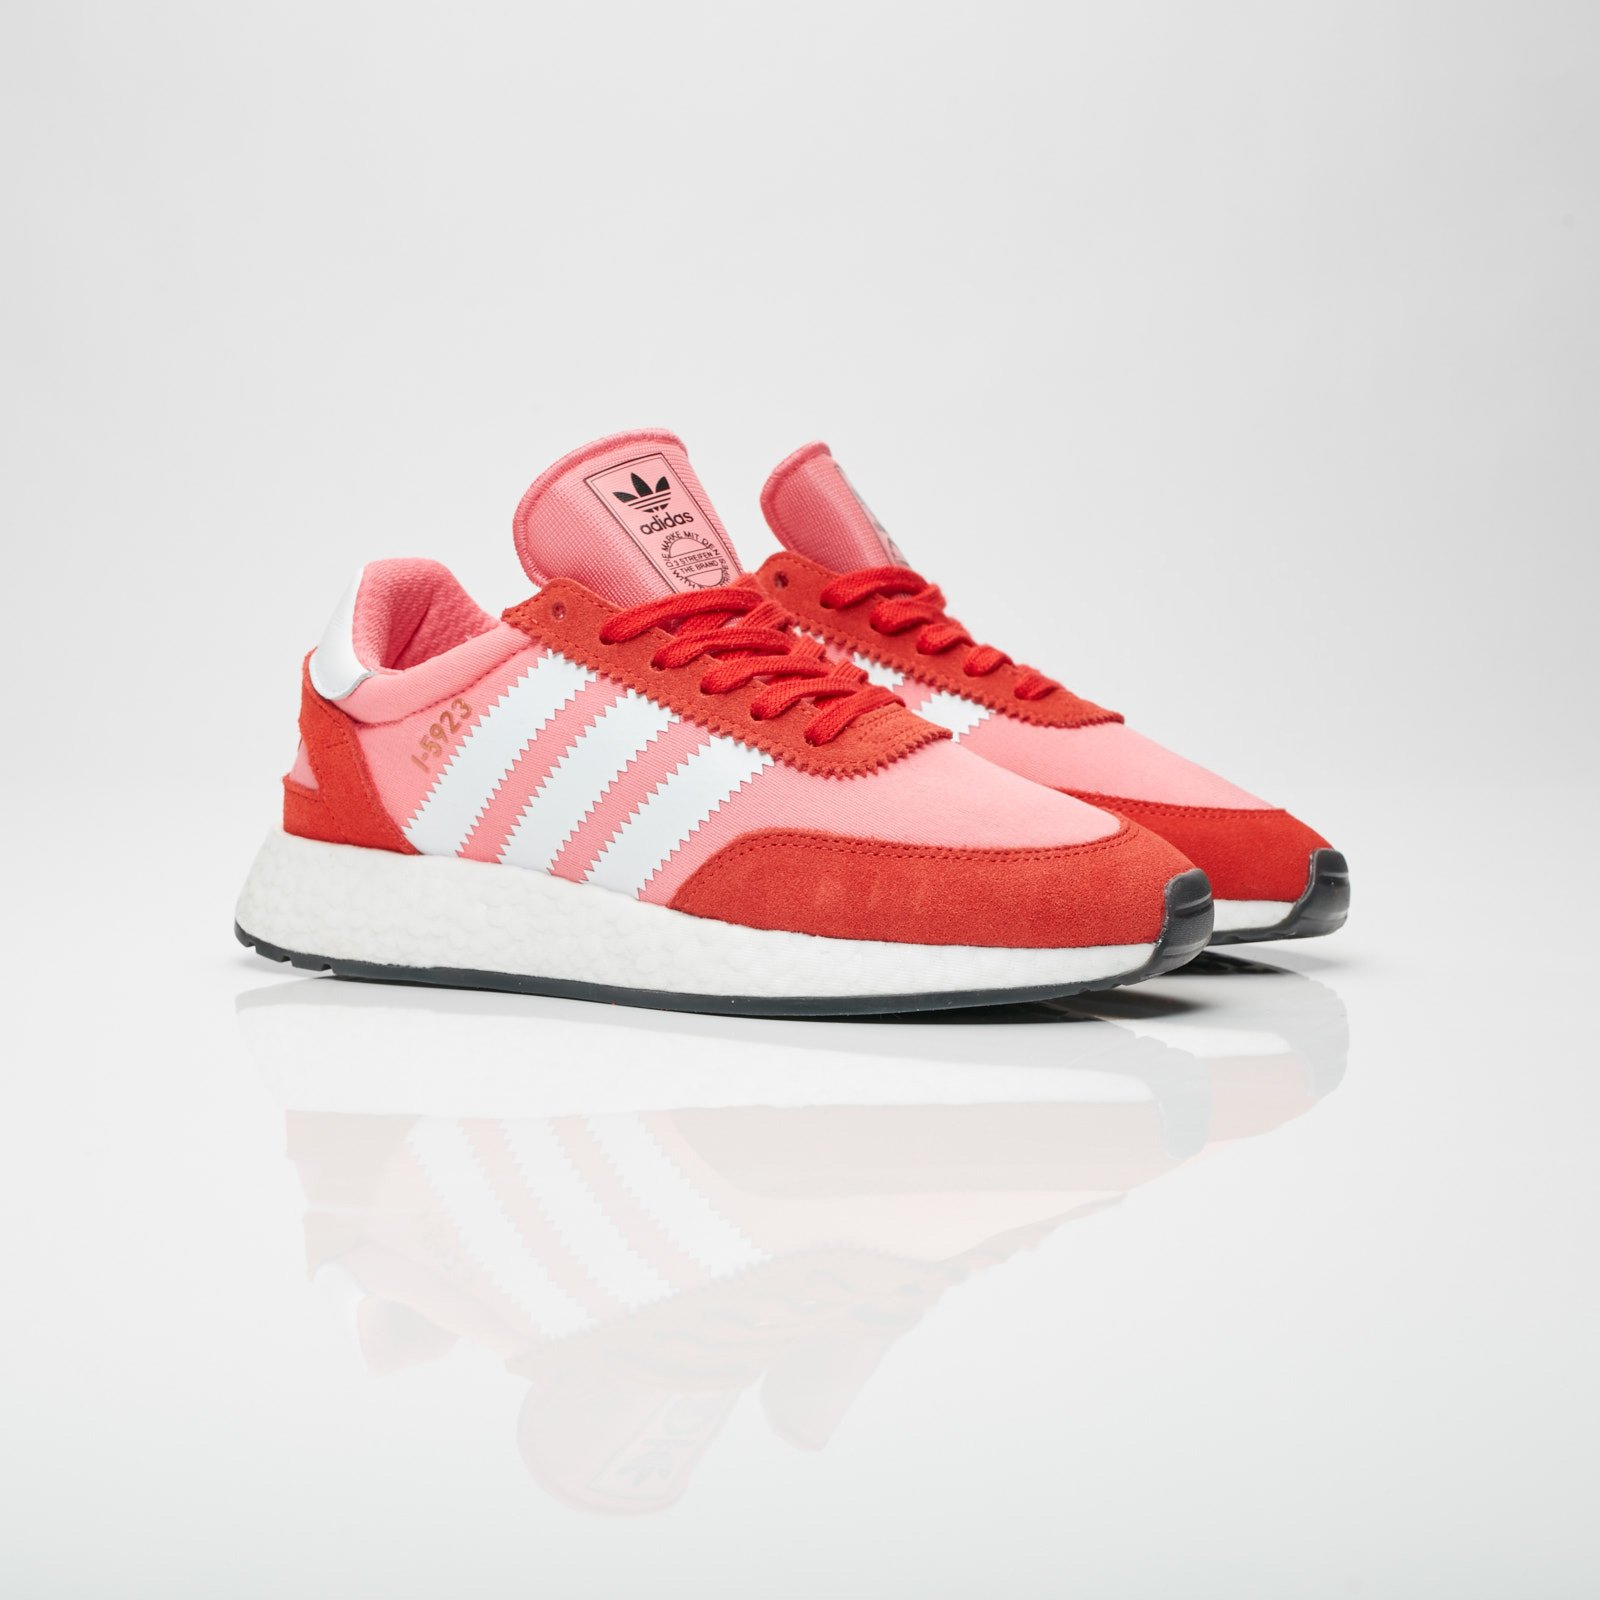 3d81aad215b164 adidas I-5923 W - Cq2527 - Sneakersnstuff | sneakers & streetwear ...